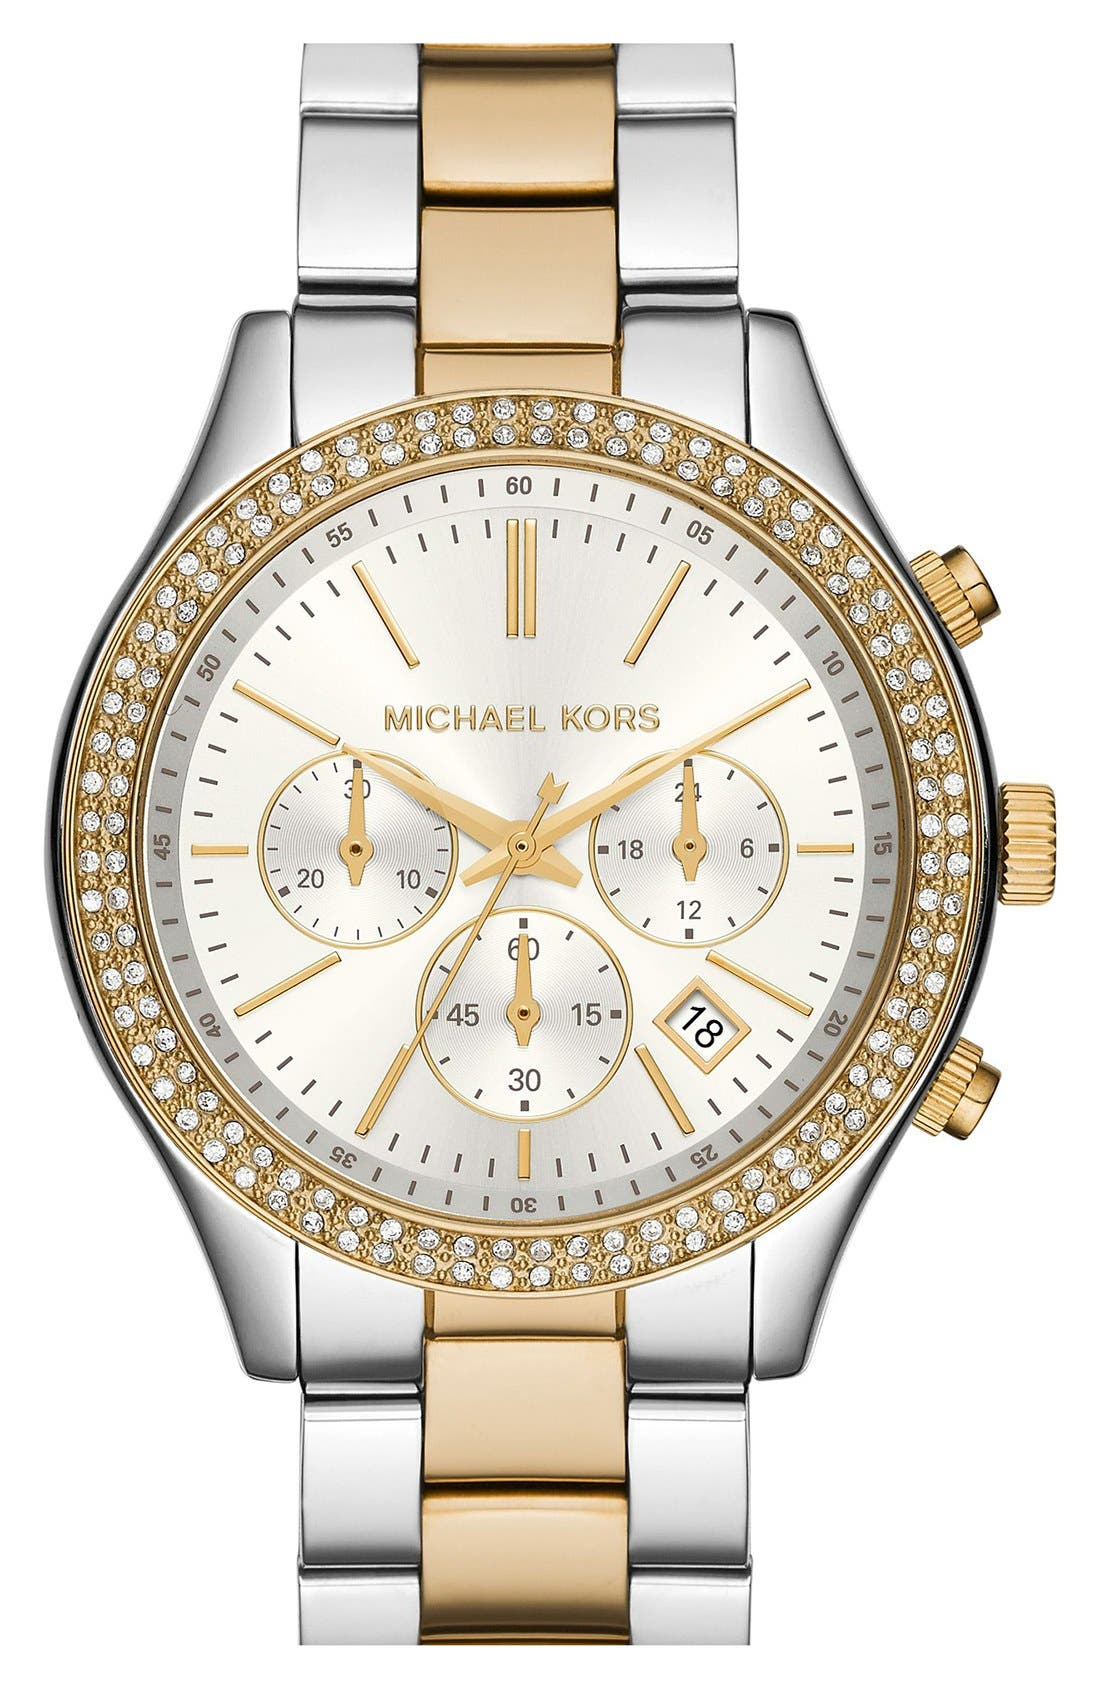 Alternate Image 1 Selected - Michael Kors 'Slim Runway' Crystal Bezel Chronograph Bracelet Watch, 42mm (Nordstrom Exclusive)